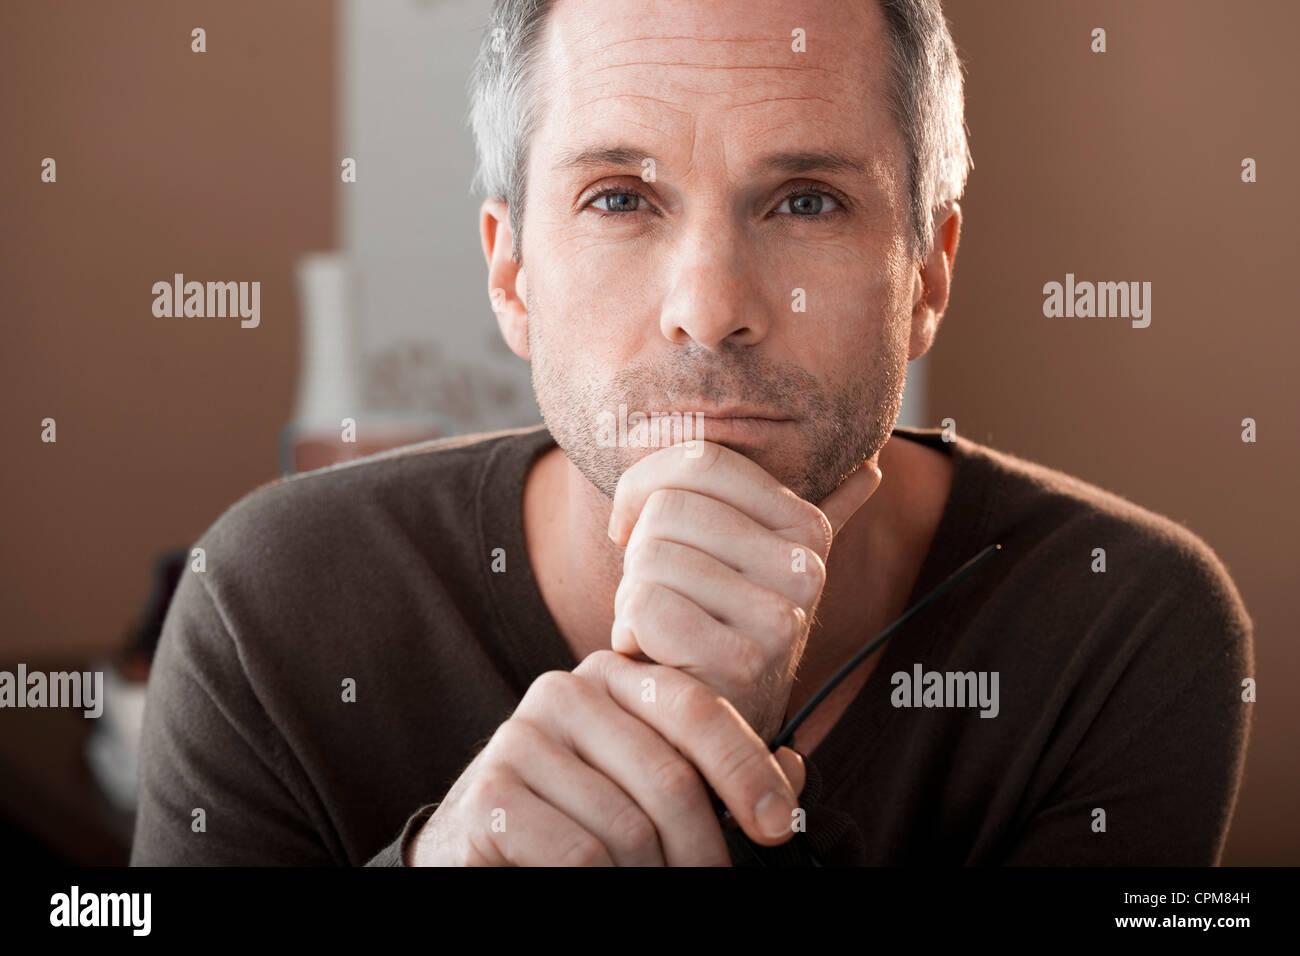 PORTRAIT OF A MAN, 40/50 - Stock Image